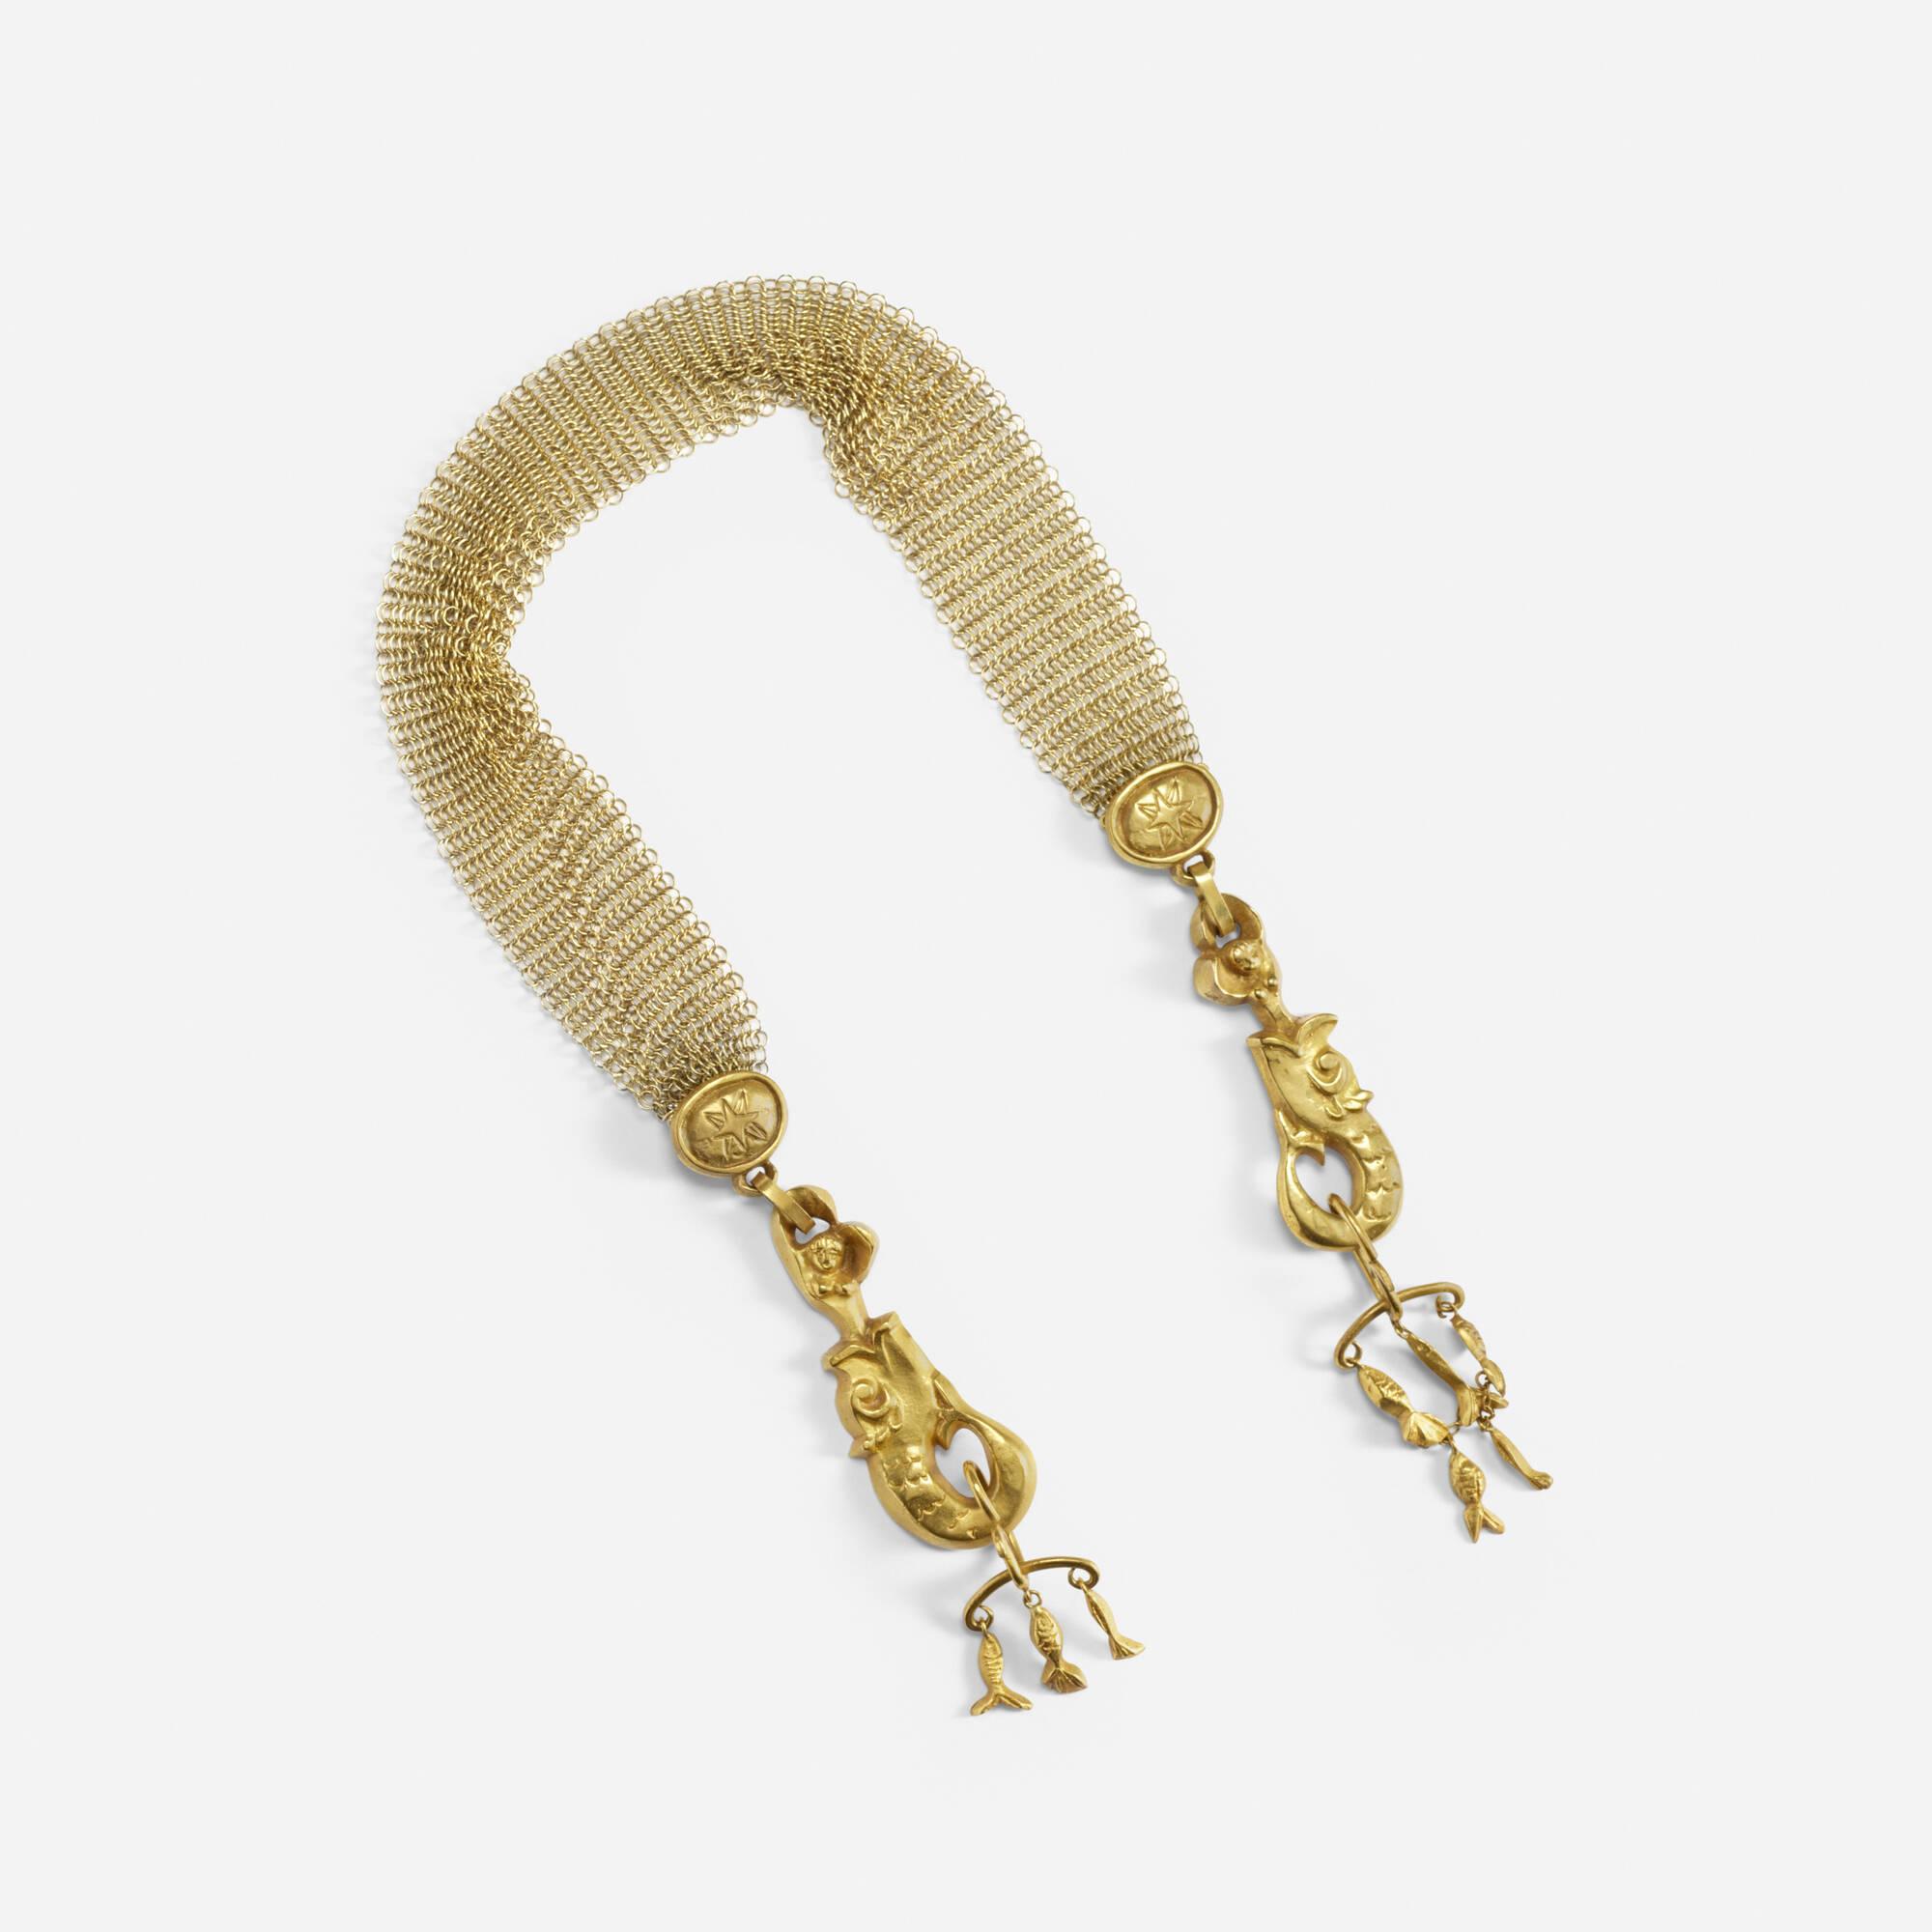 273: Line Vautrin / La Peche Mirauleuse necklace (1 of 3)